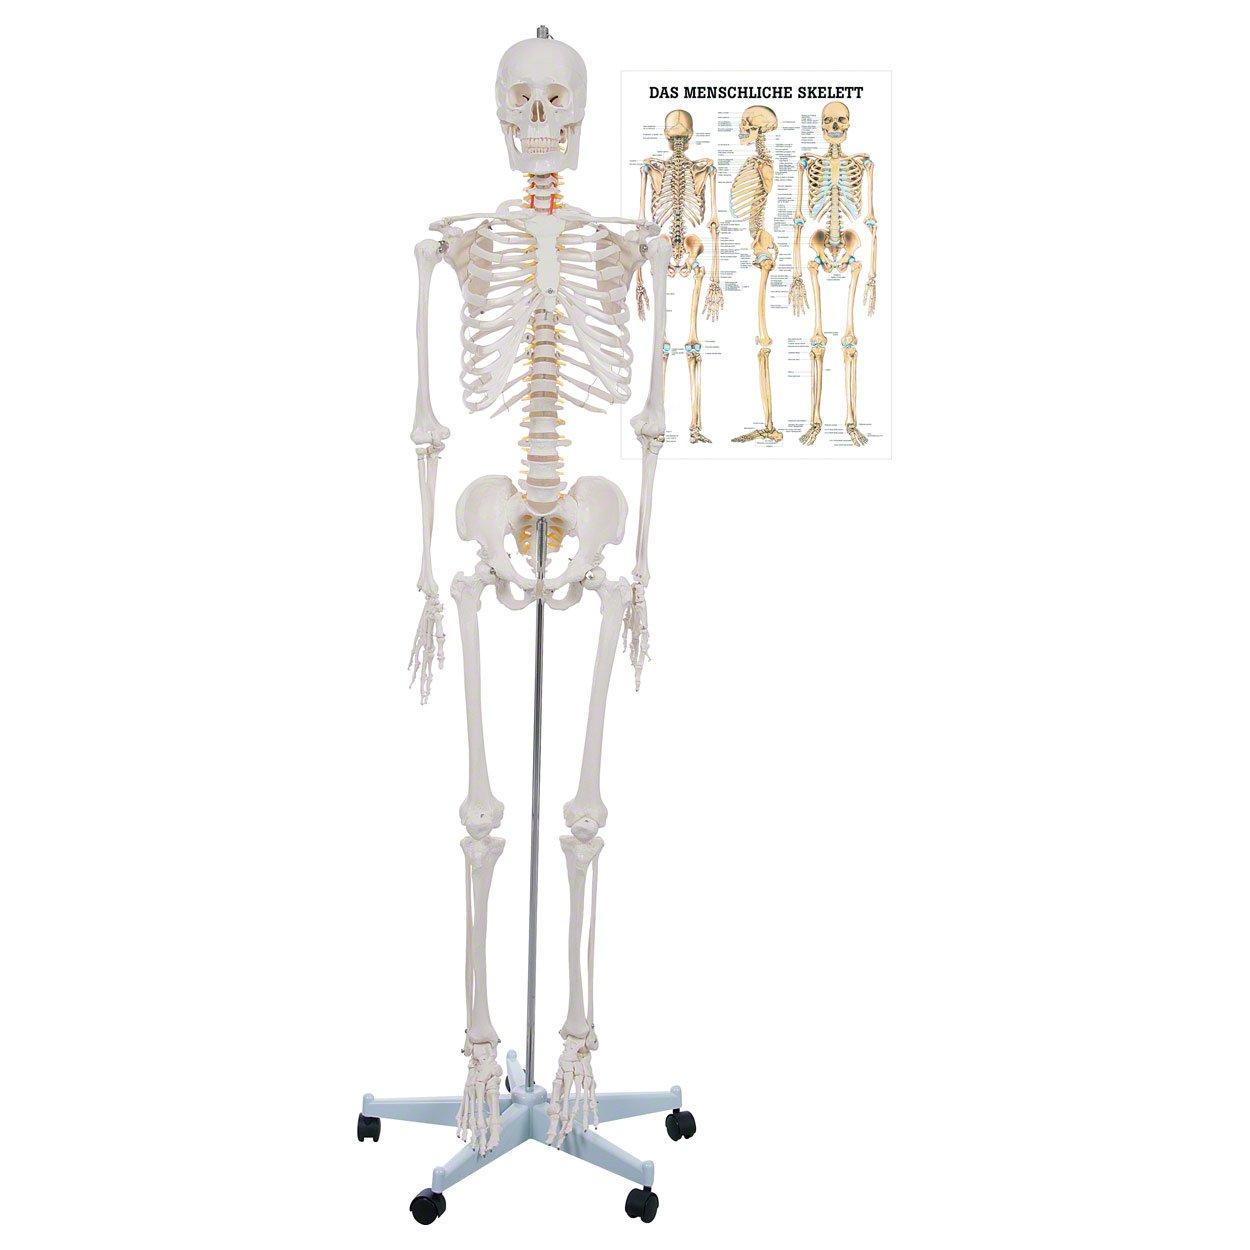 Sport-Tec Skelett Oscar inkl. Stativ, 178 cm und Lehrtafel Das ...